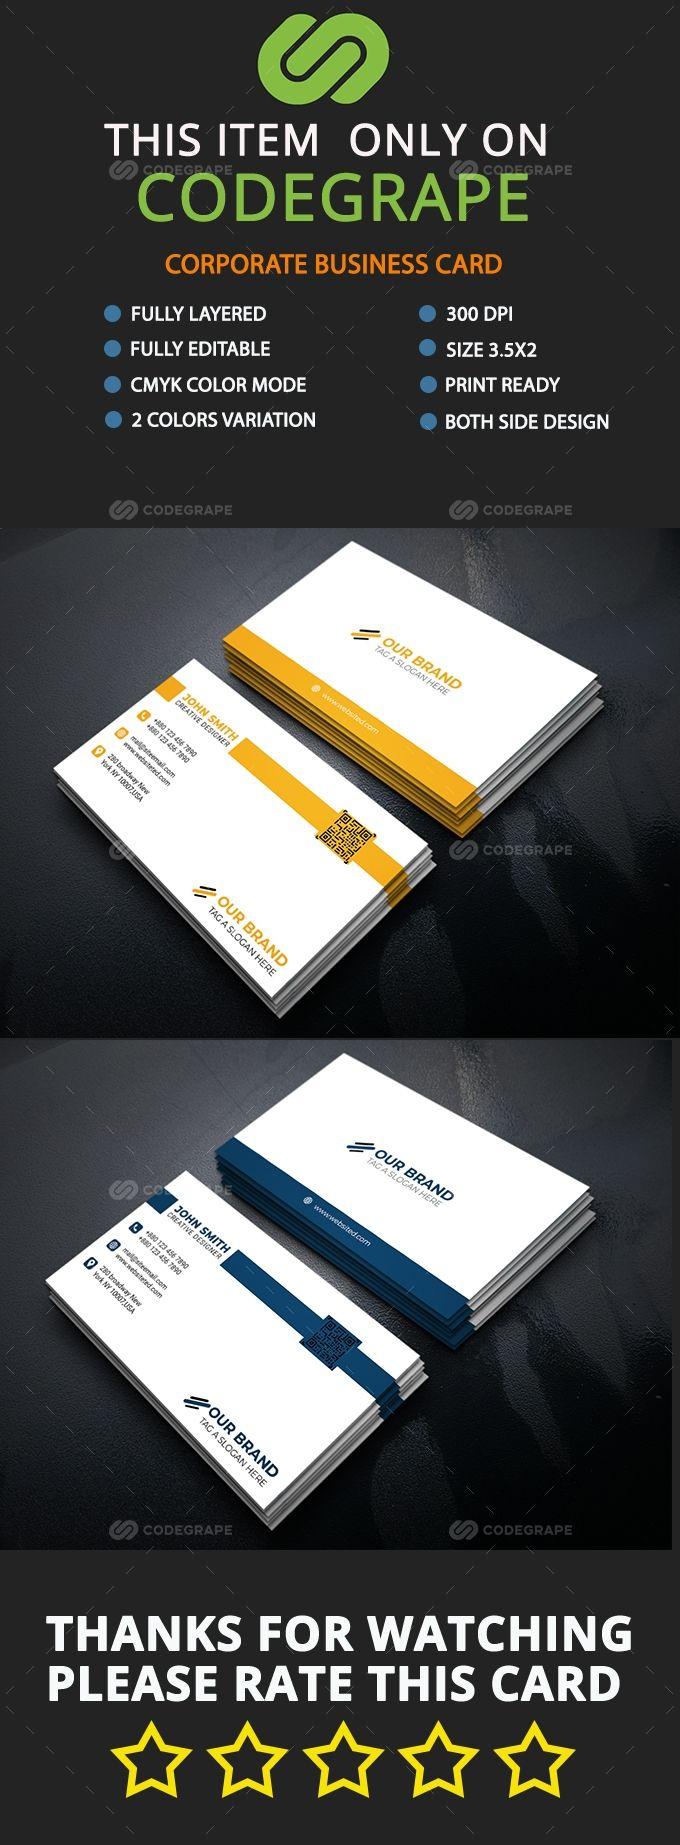 Business Card Template In 2021 Business Card Template Corporate Business Card Card Template